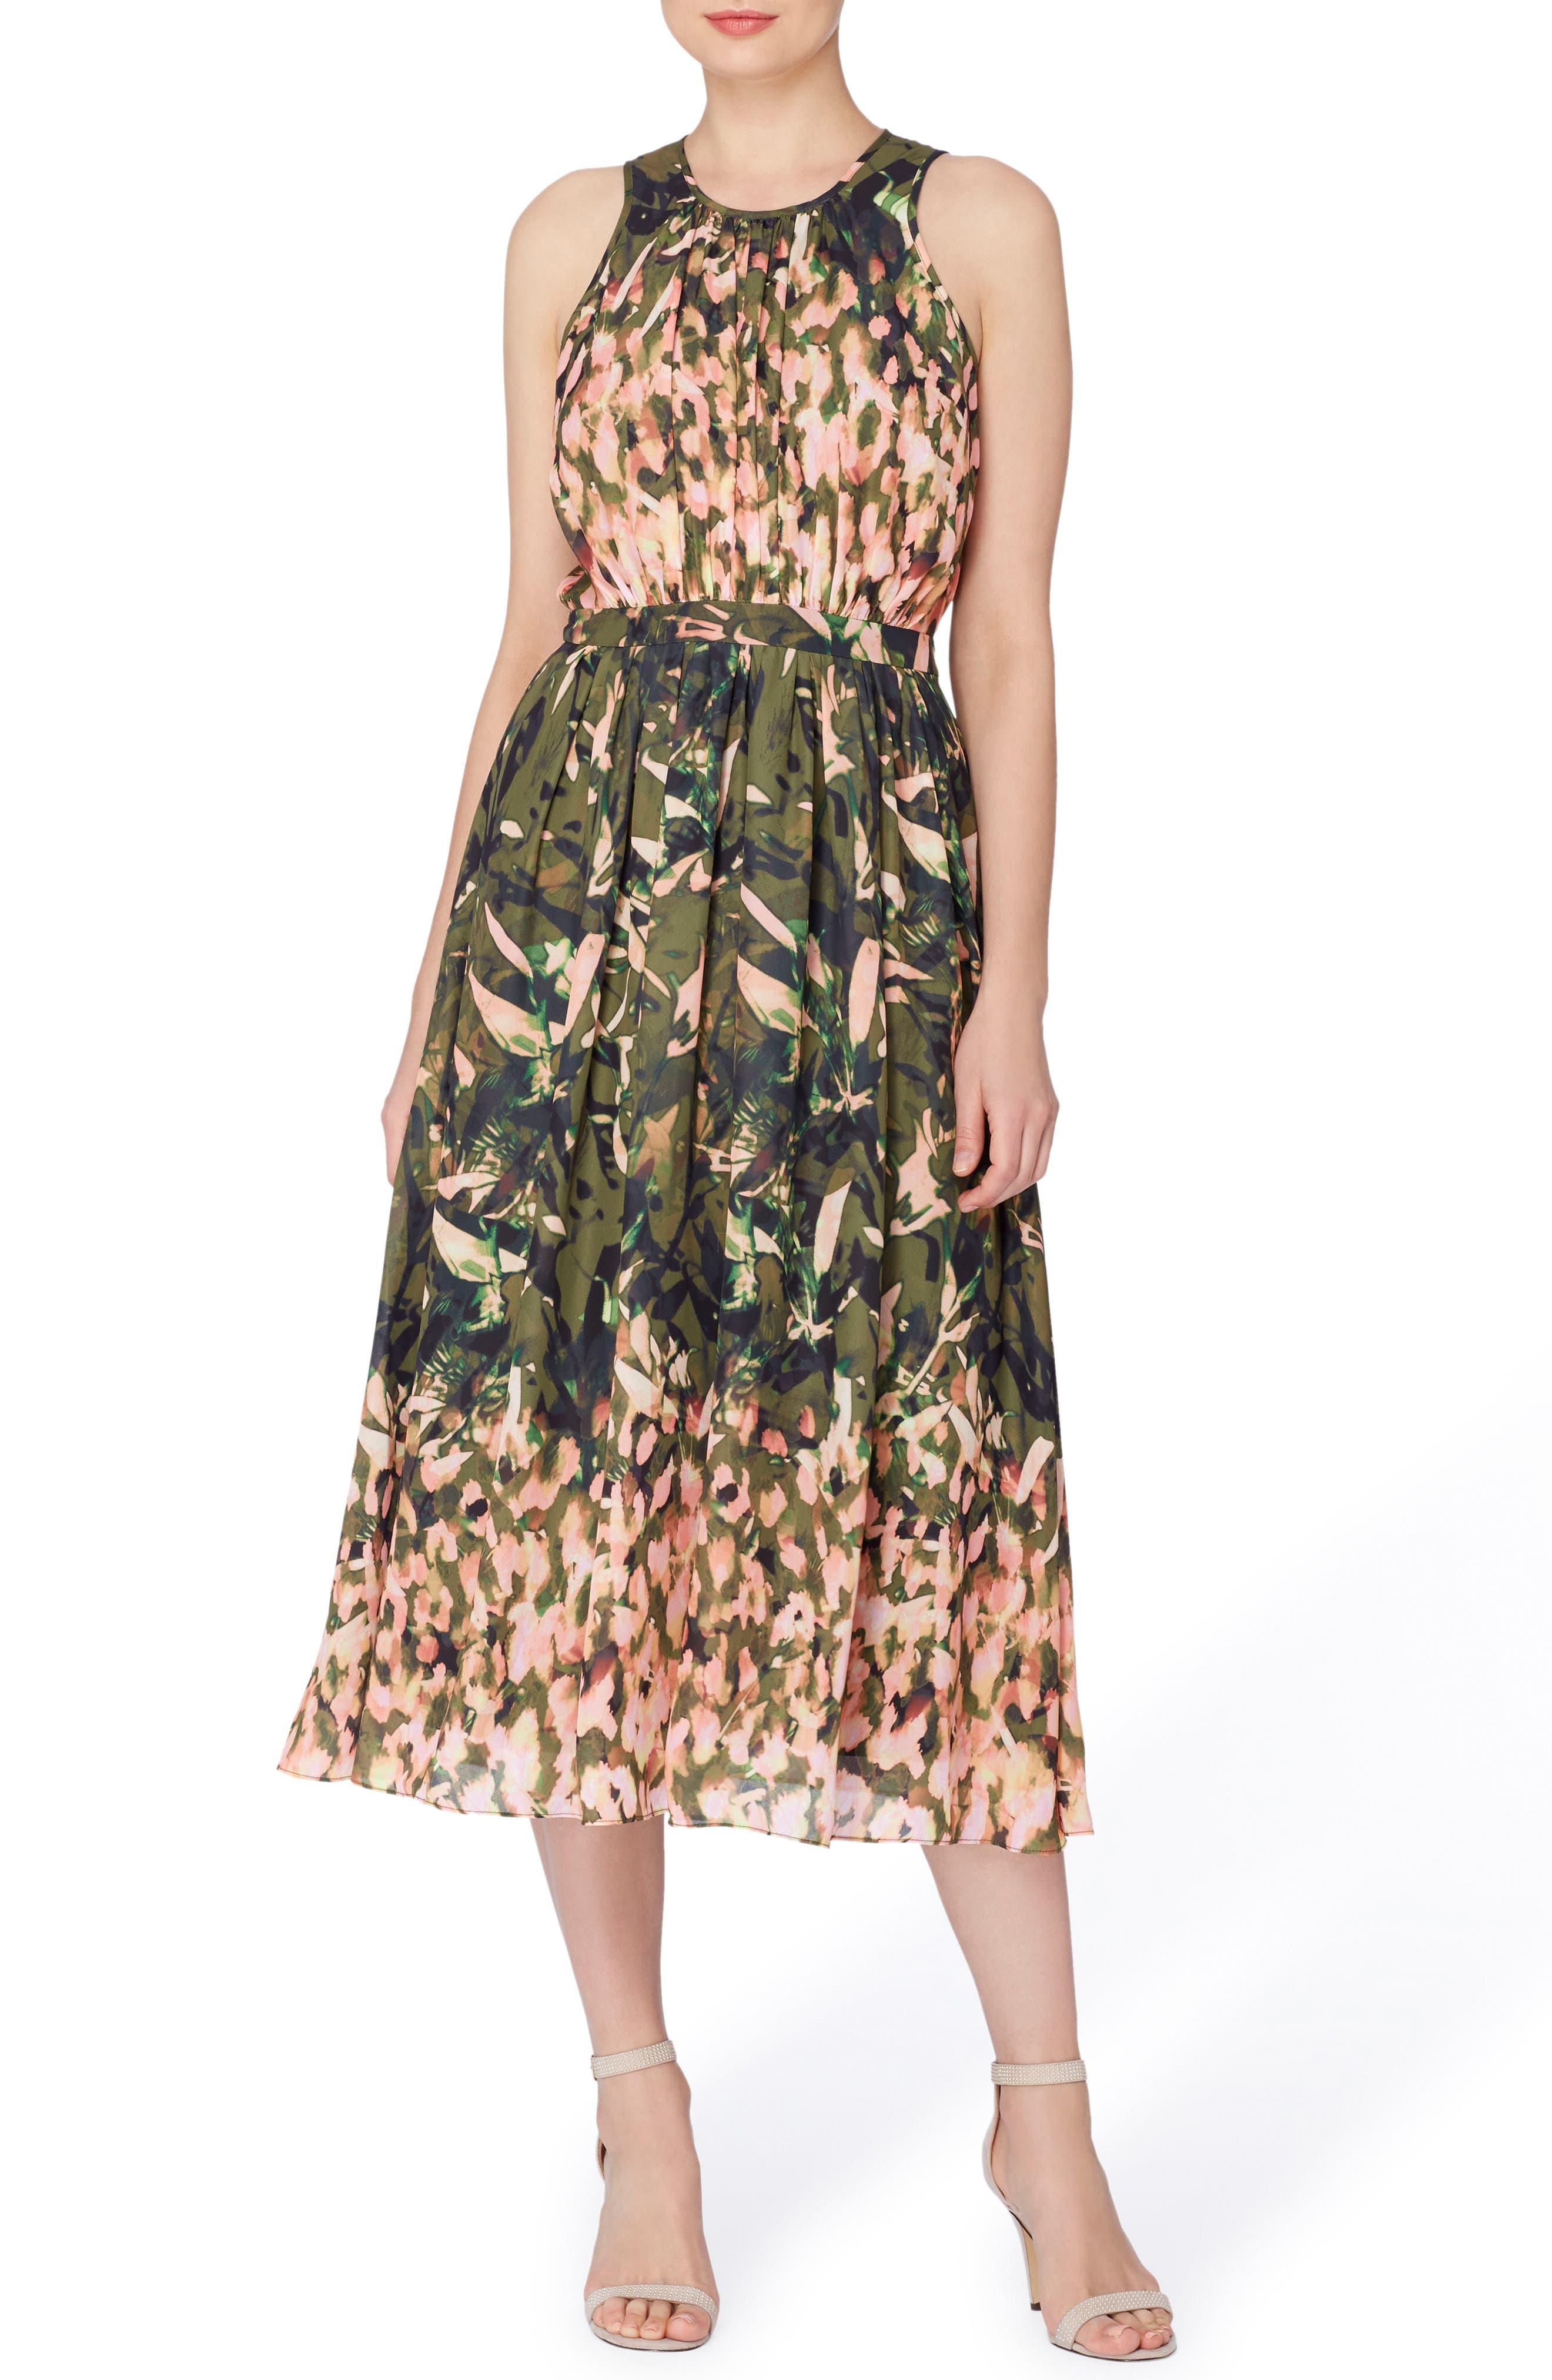 Alternate Image 1 Selected - Catherine Catherine Malandrino Alfie Print Fit & Flare Midi Dress